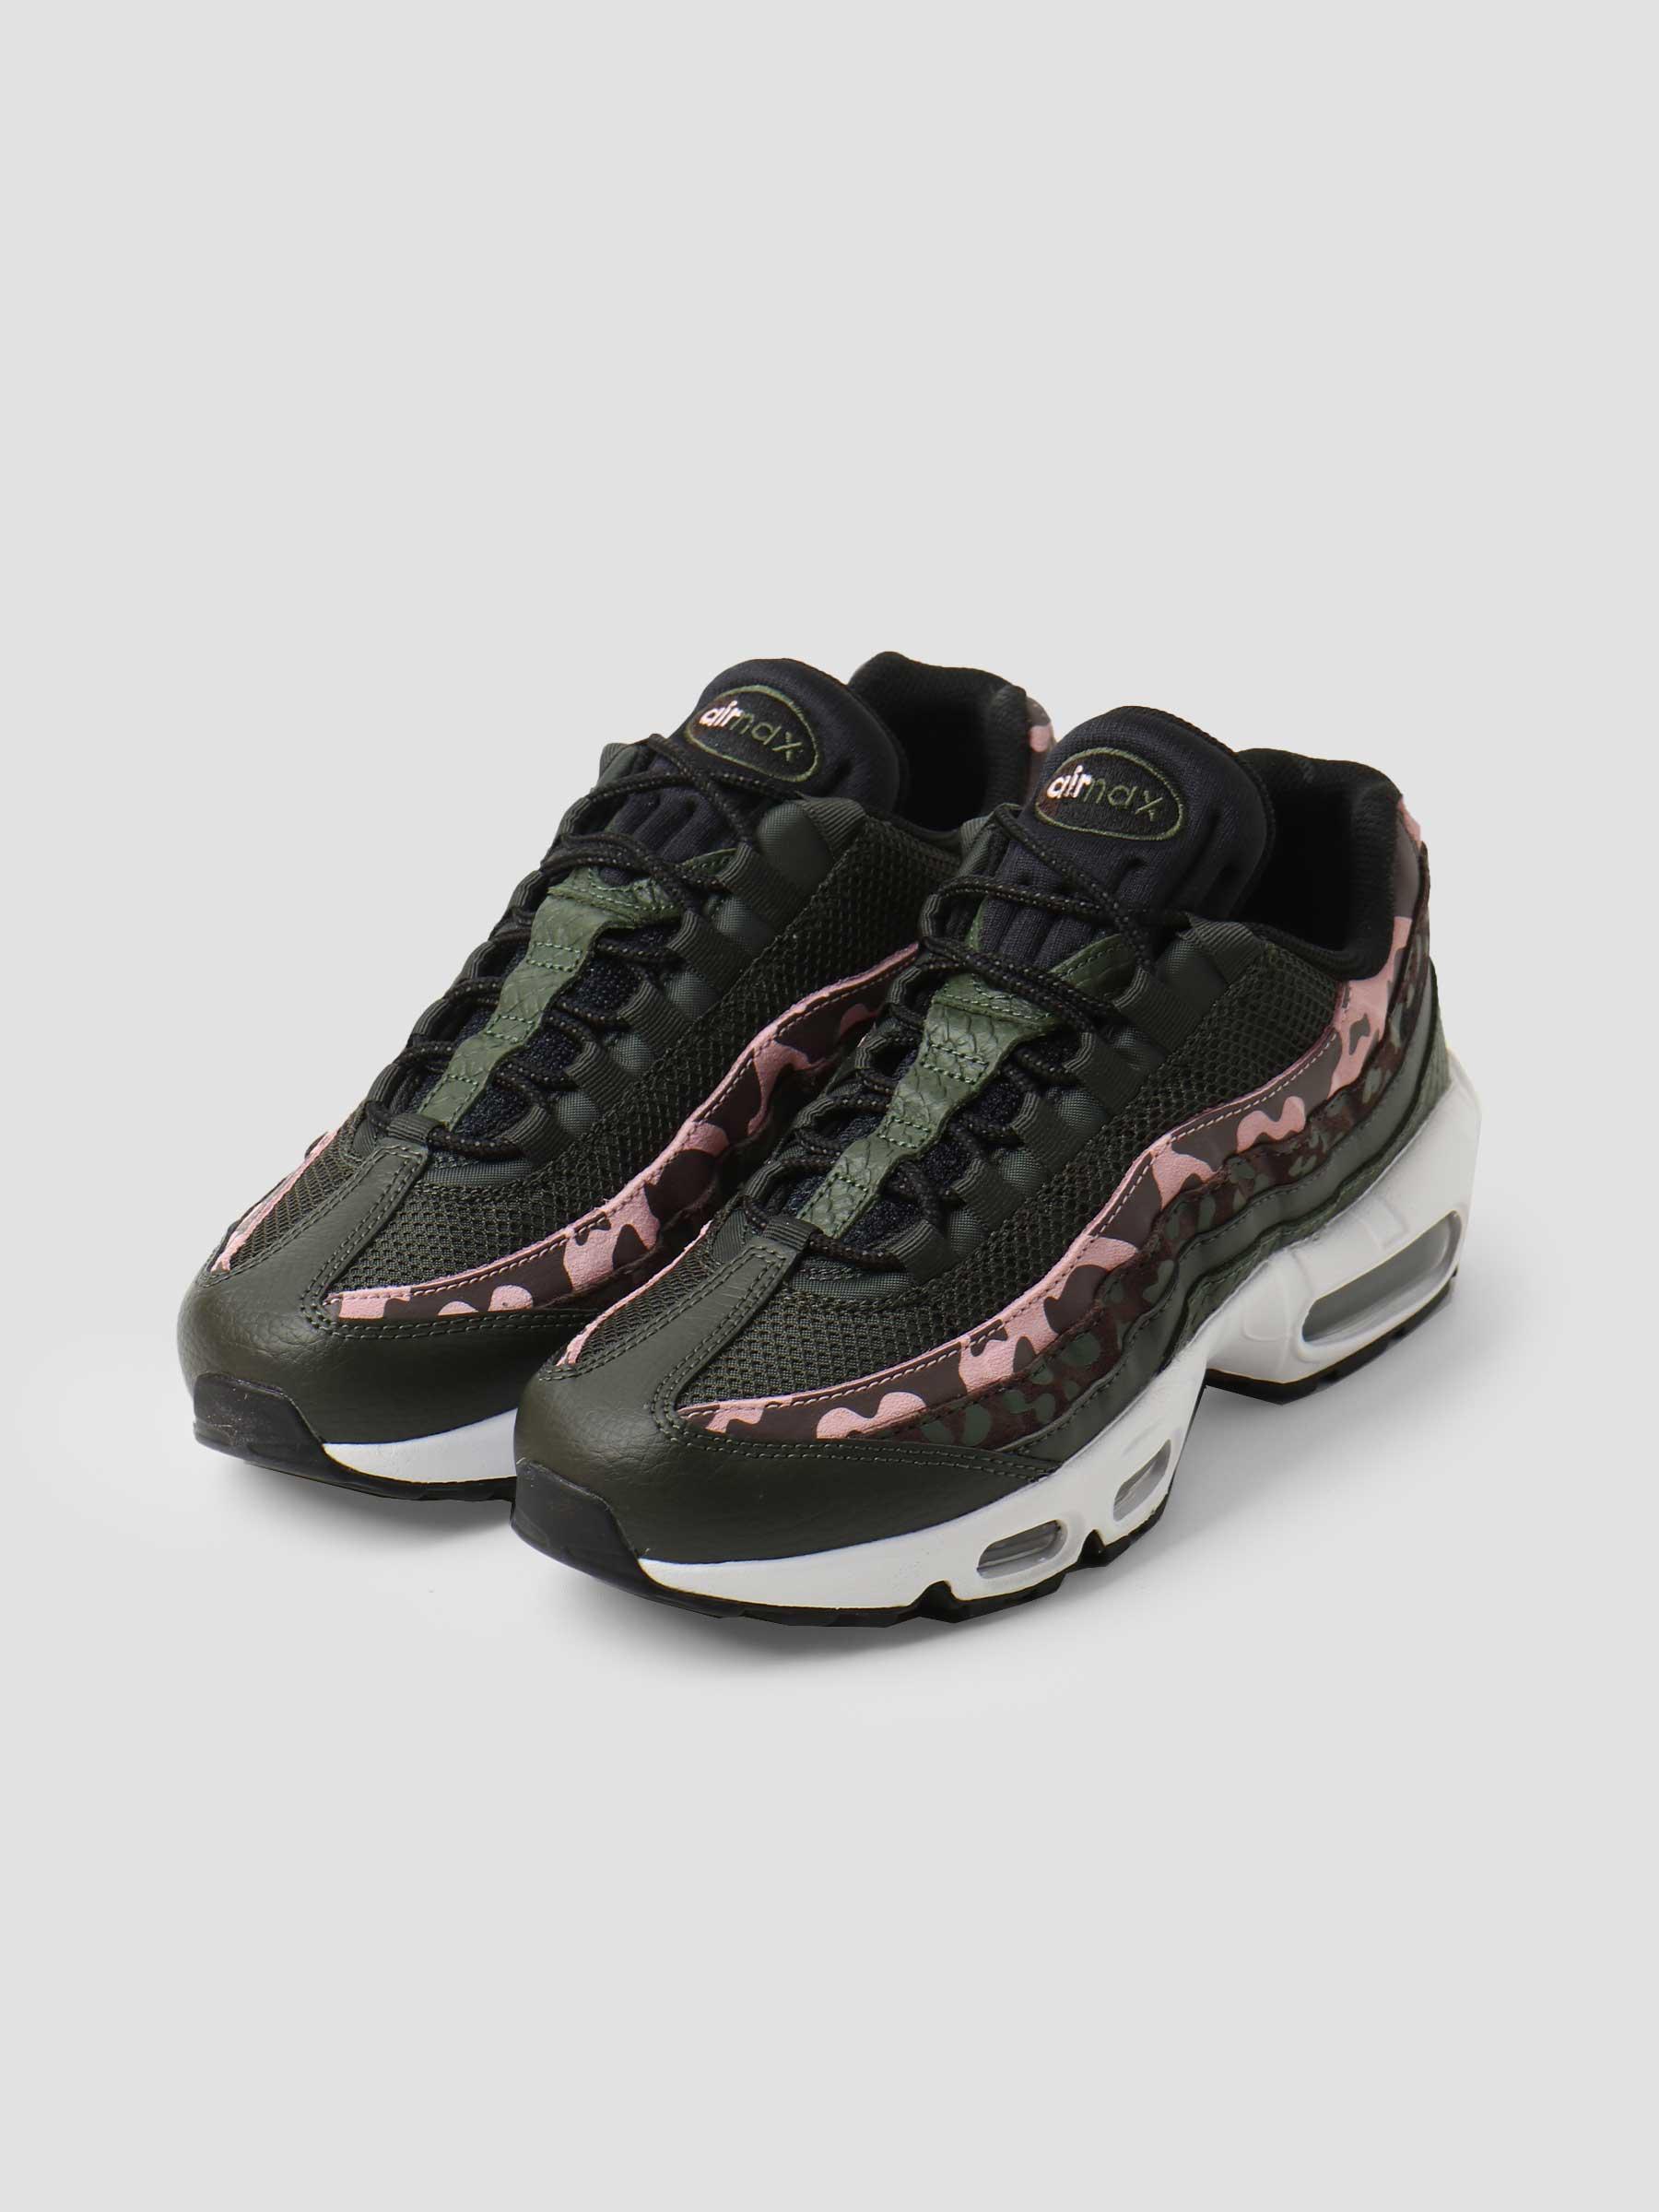 Wmns Nike Air Max 95 Brown Basalt Black Sequoia Pink Glaze DN5462-200